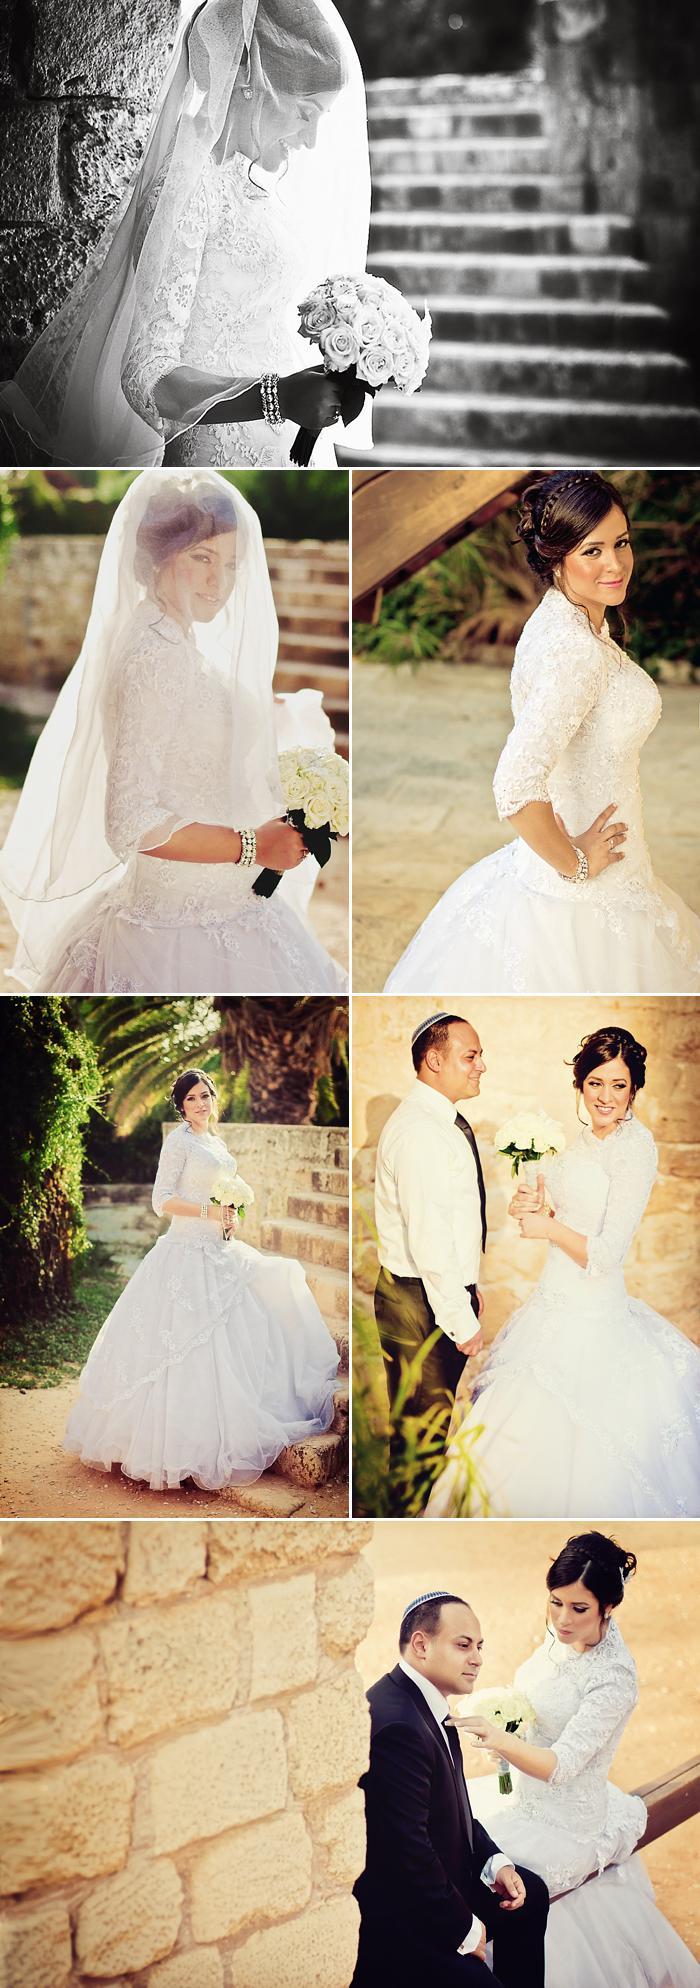 Wedding Photographer Mombasa Kenya Zanzibar_0010.jpg